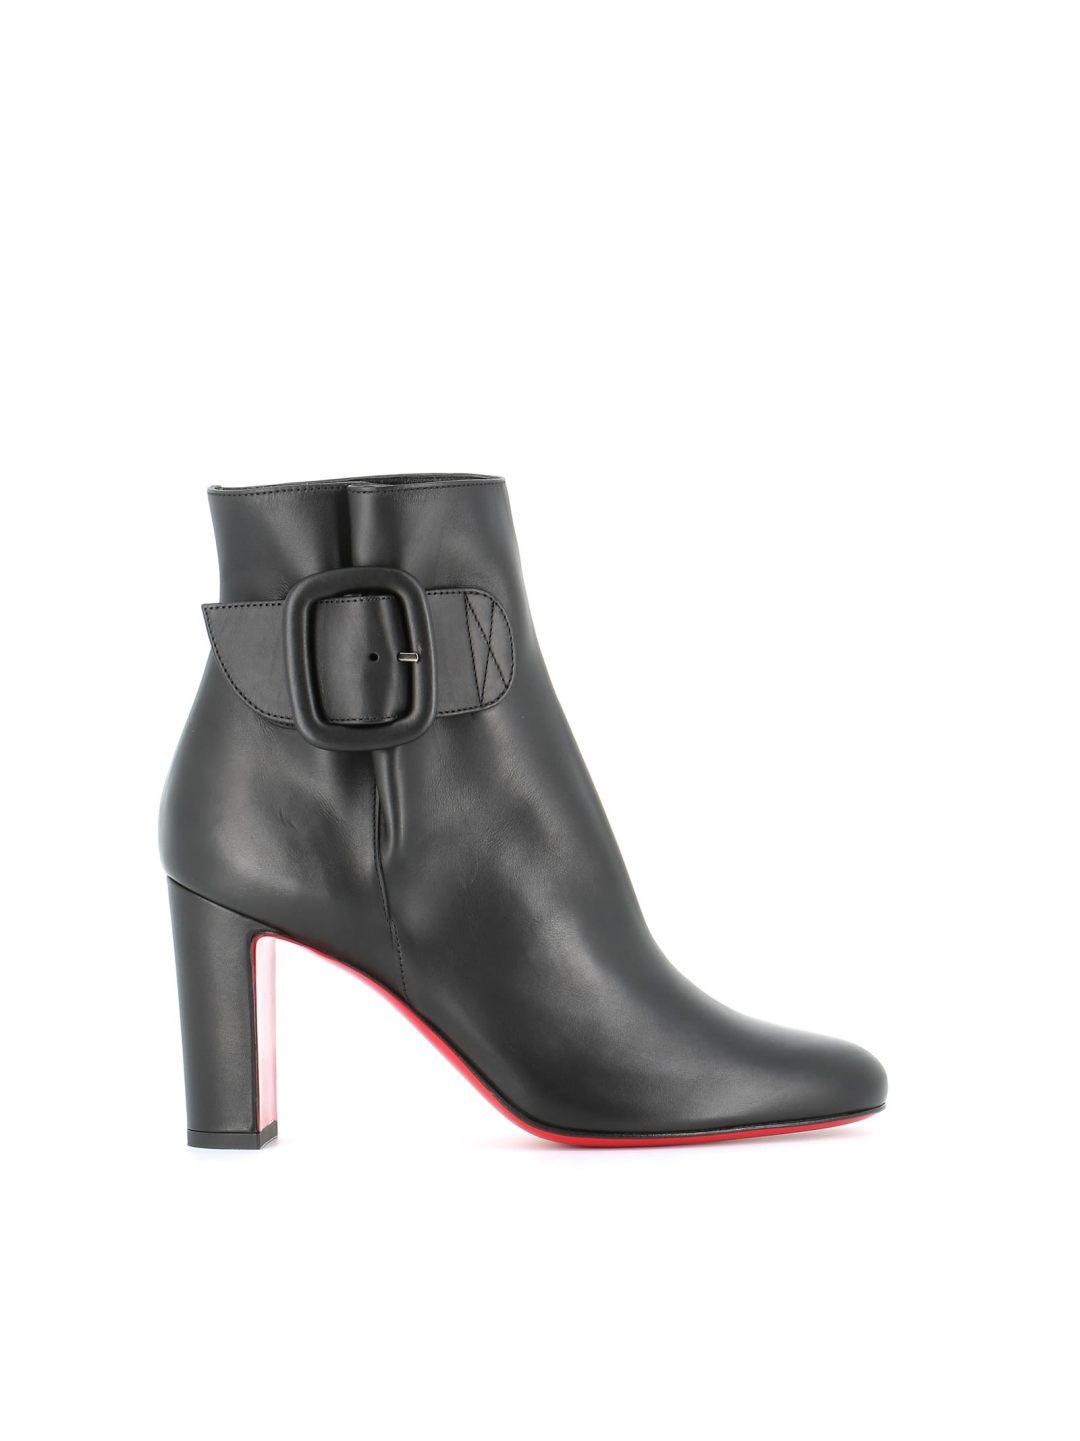 "0bac72bf2507 Christian Louboutin Ankle Boots ""tres Olivia"" – Italist.com US –  910.83"